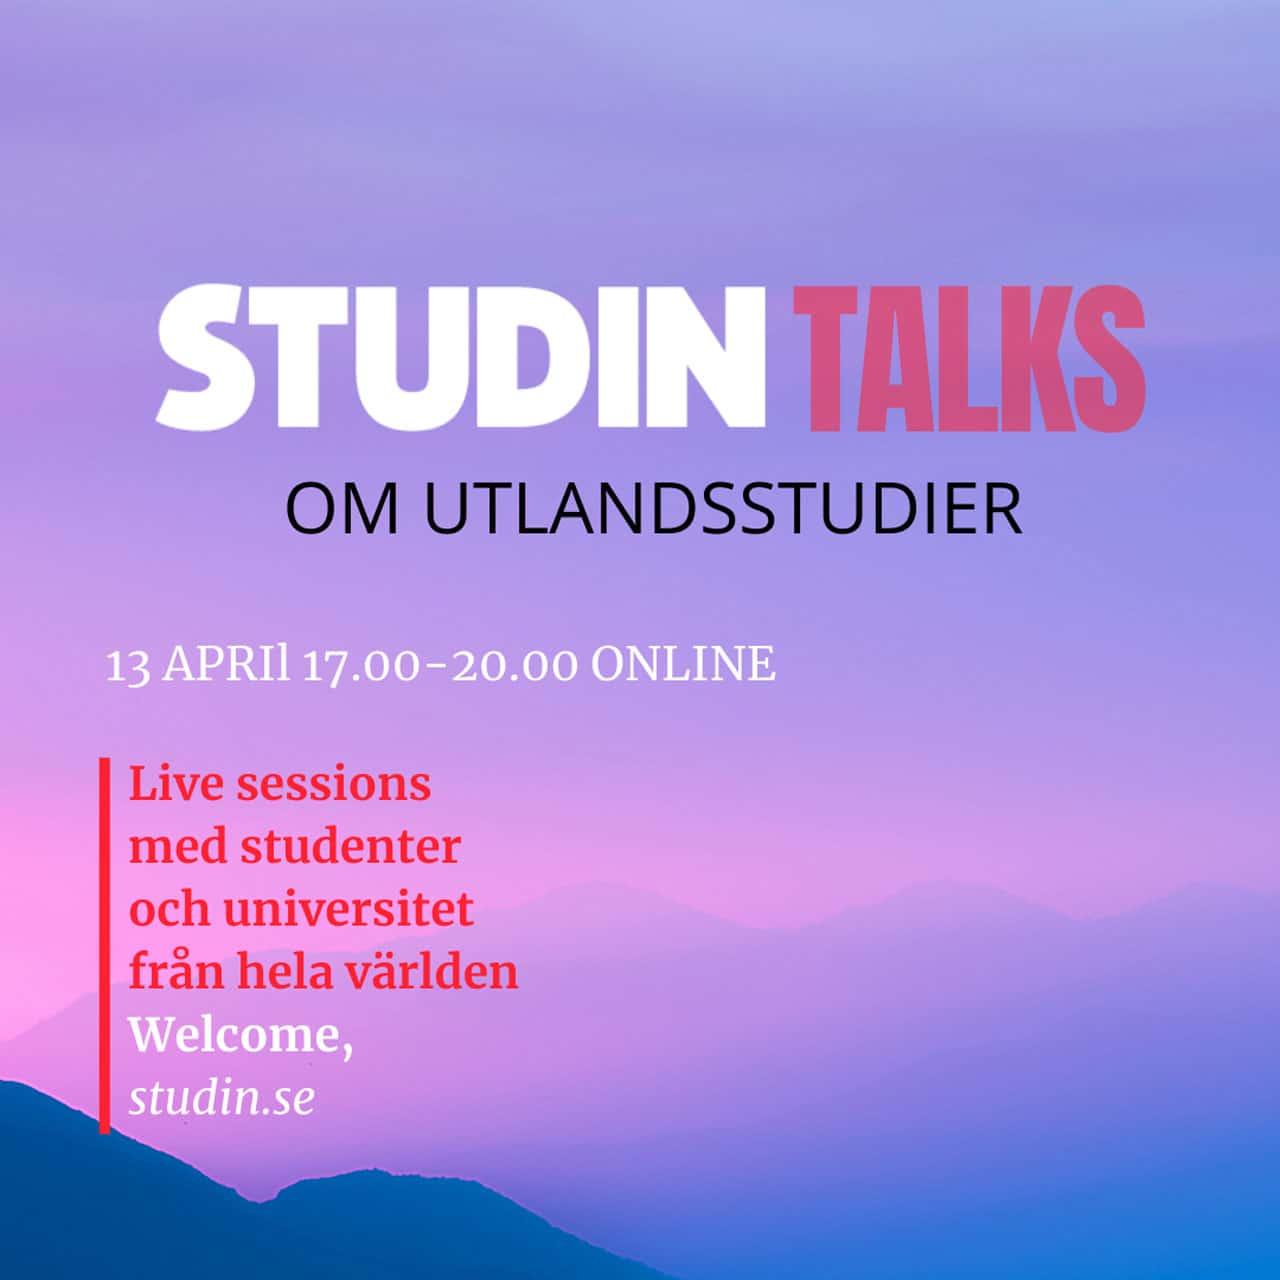 studin talks utlandsstudier